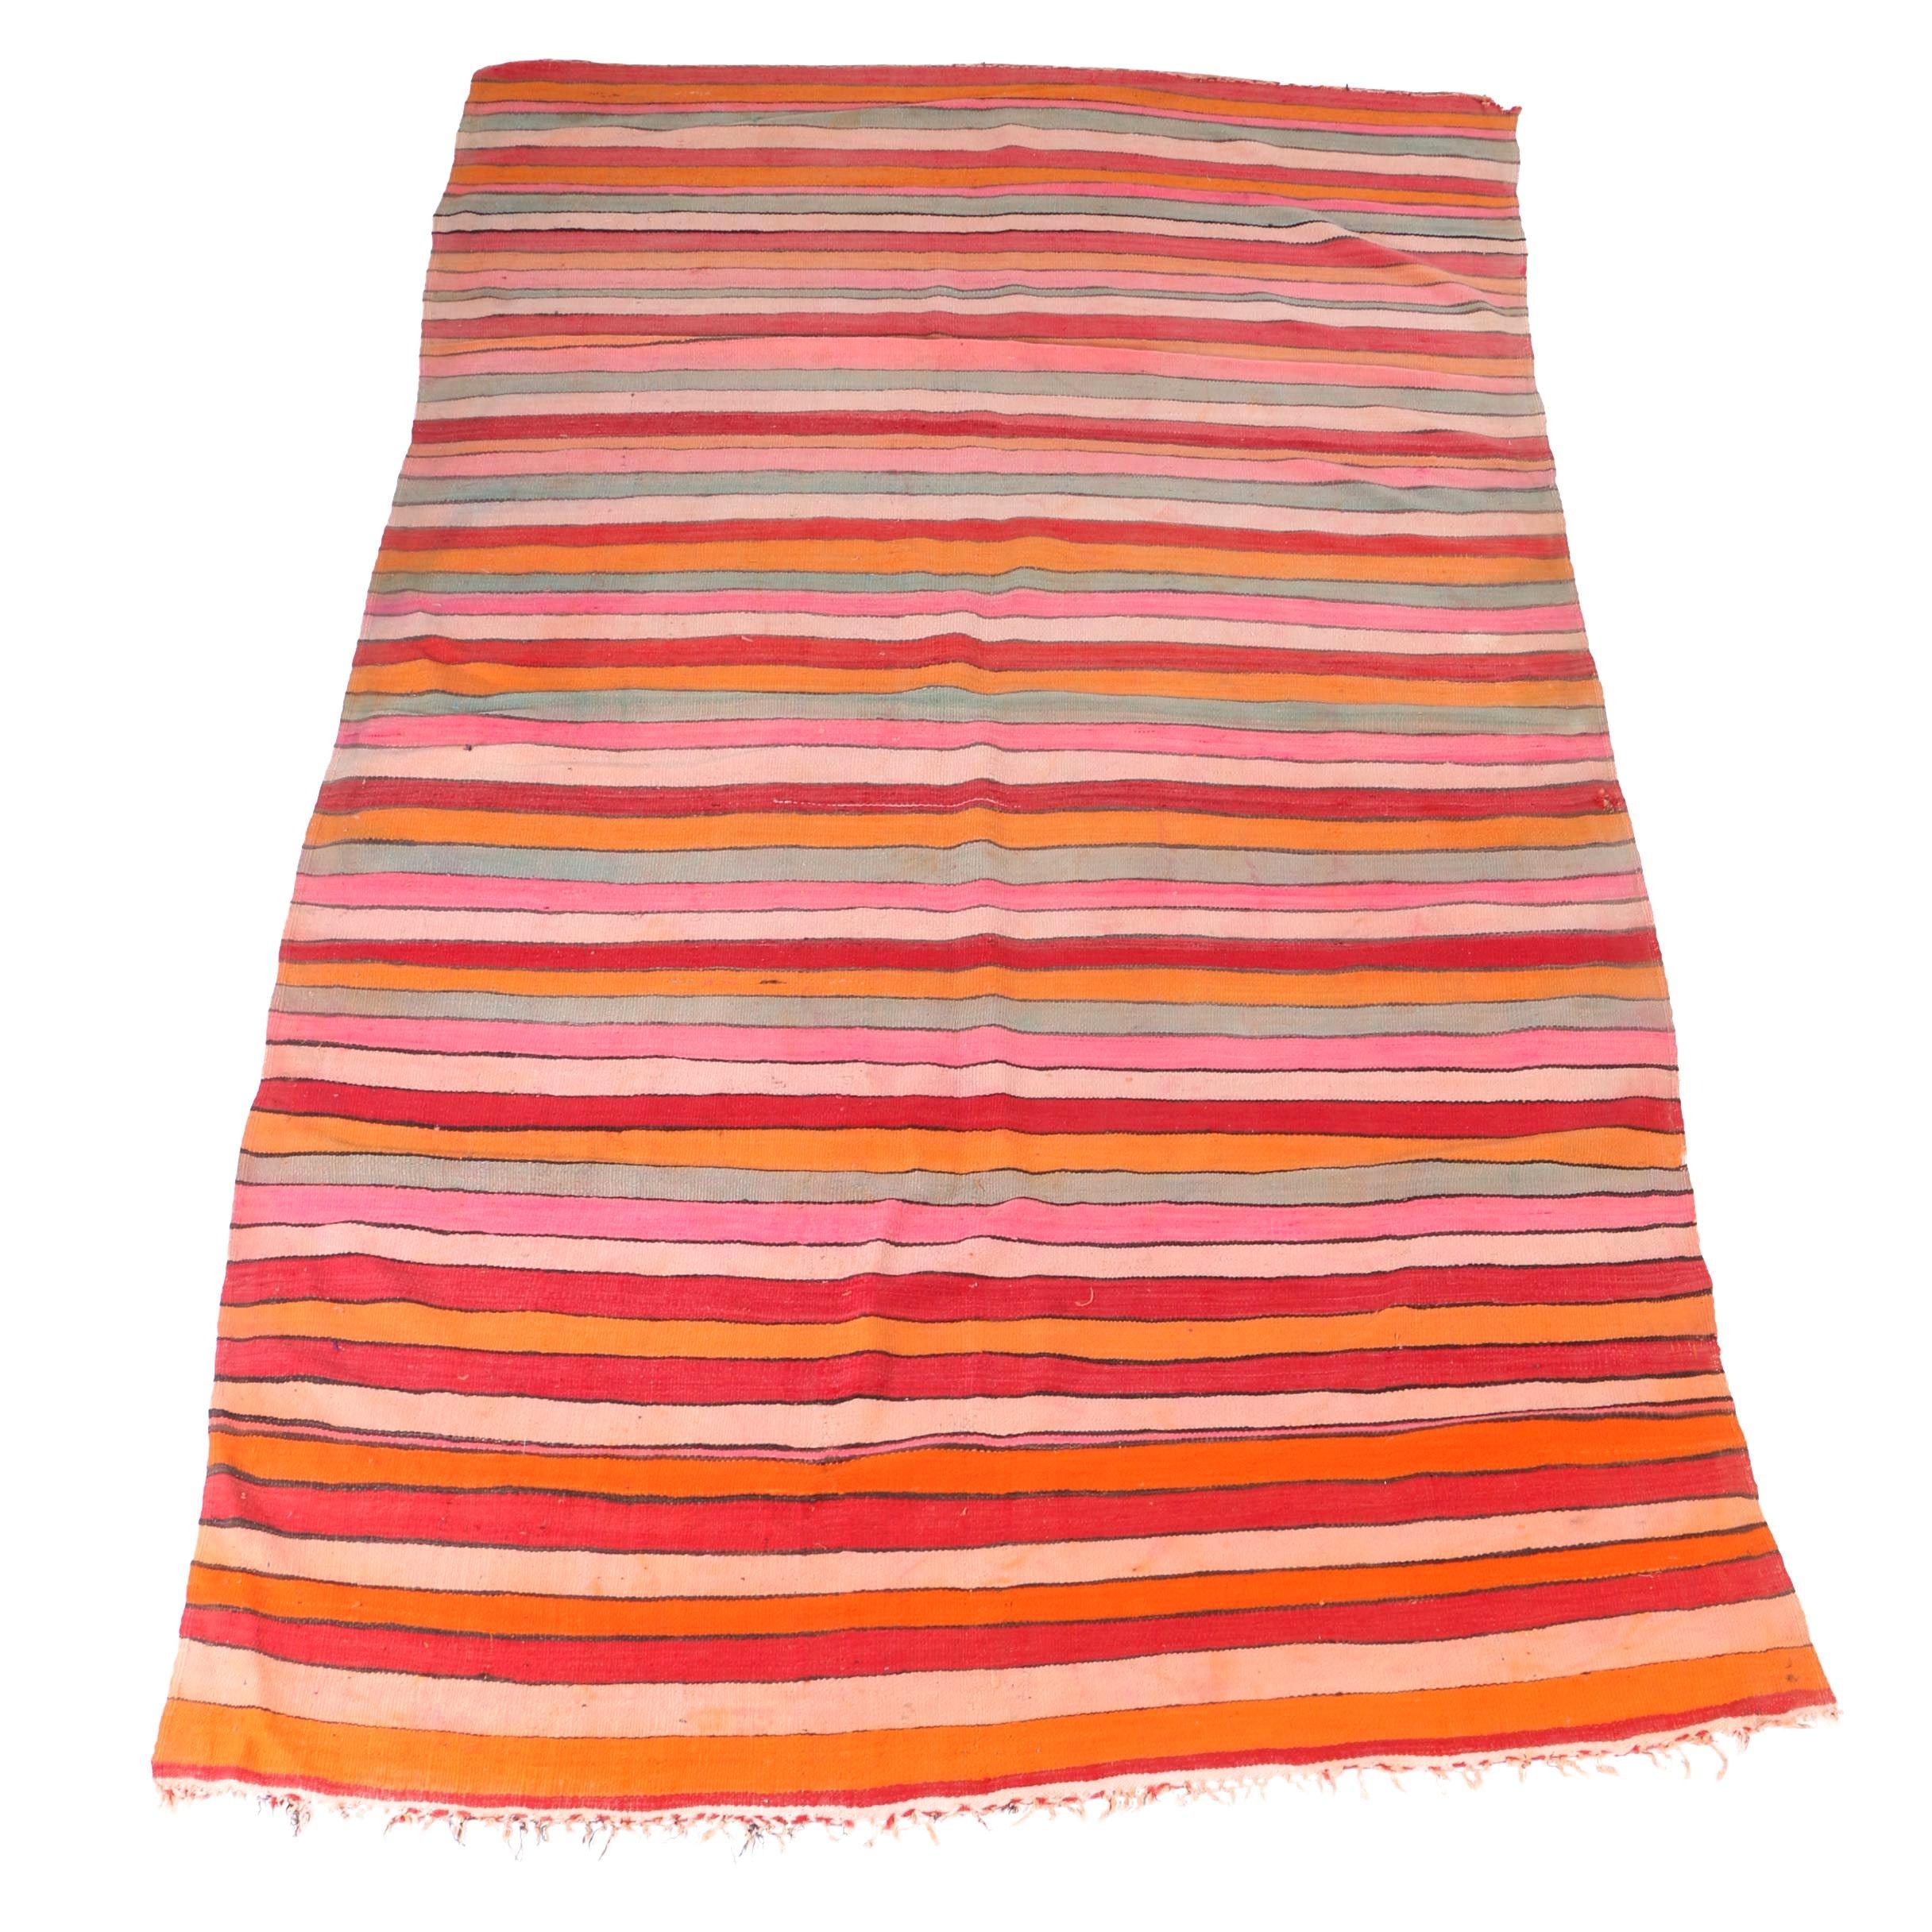 Handwoven Berber Blanket or Area Rug